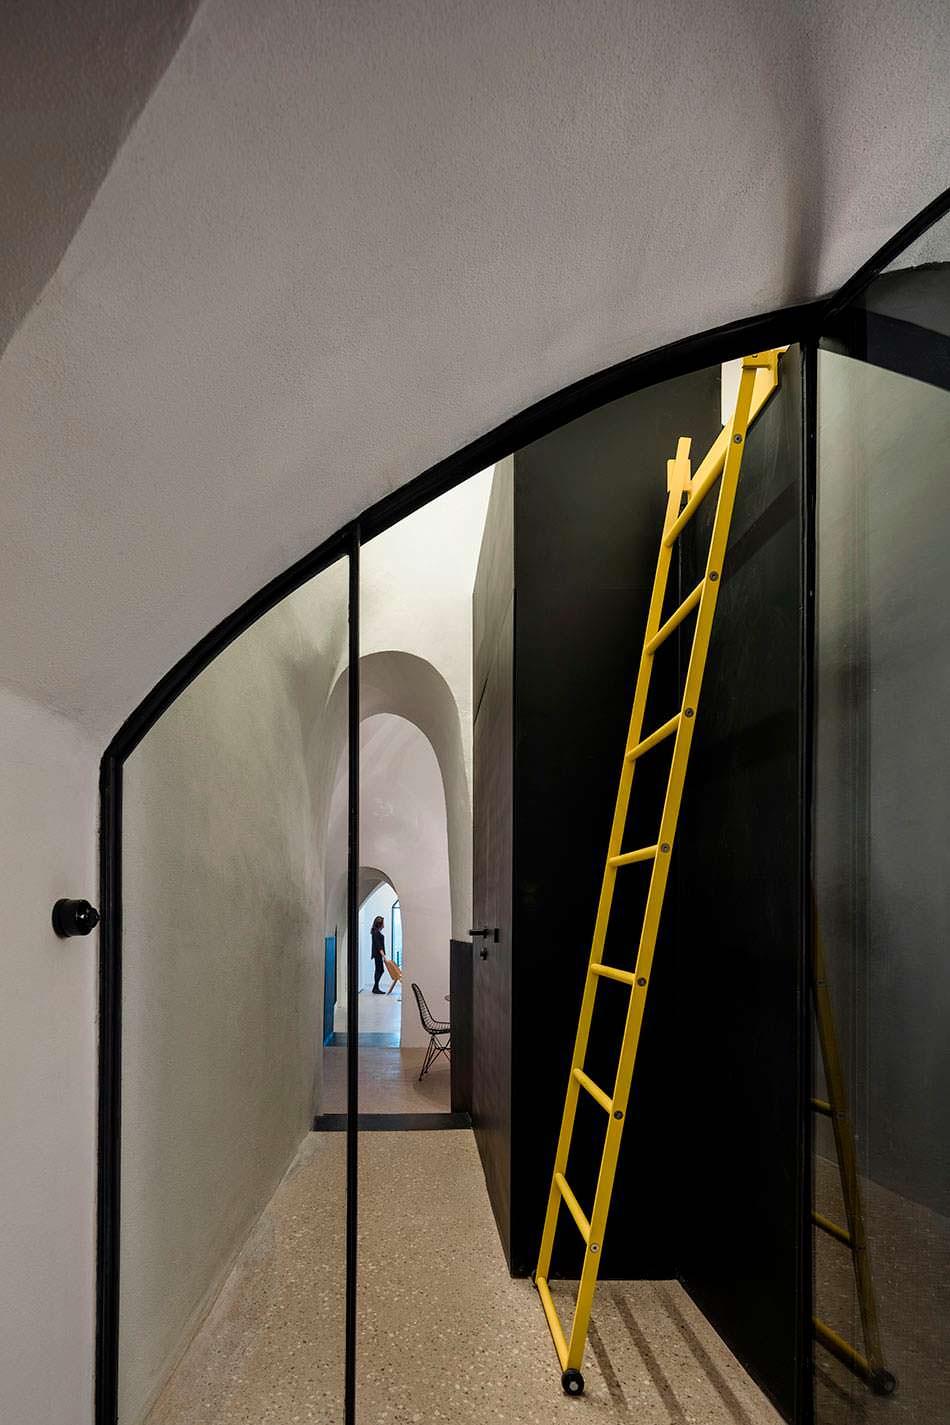 Дизайн узкого коридора с арками вместо дверей